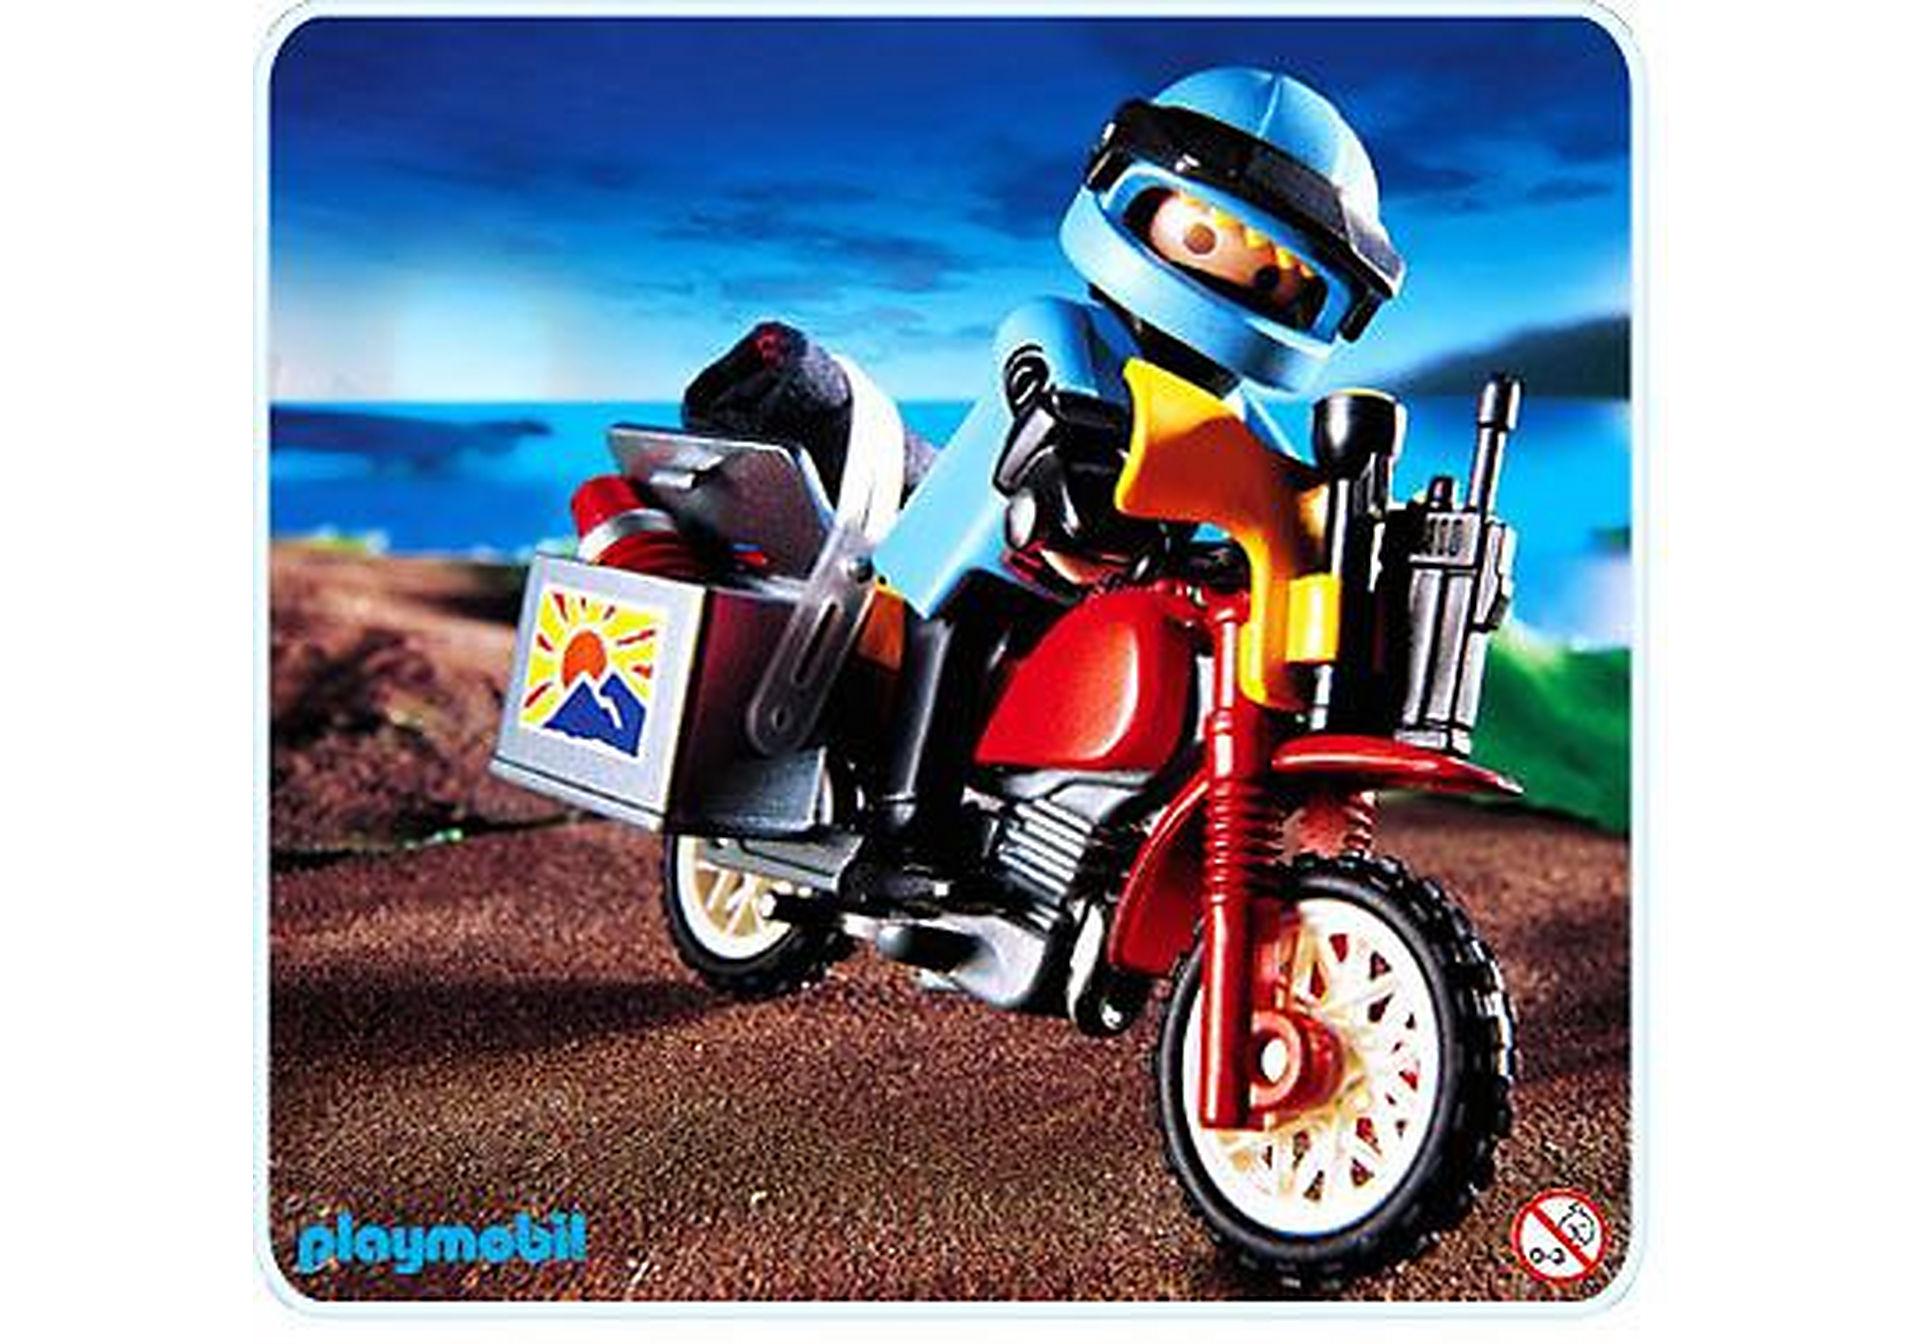 3222-A Pilote / moto raid zoom image1